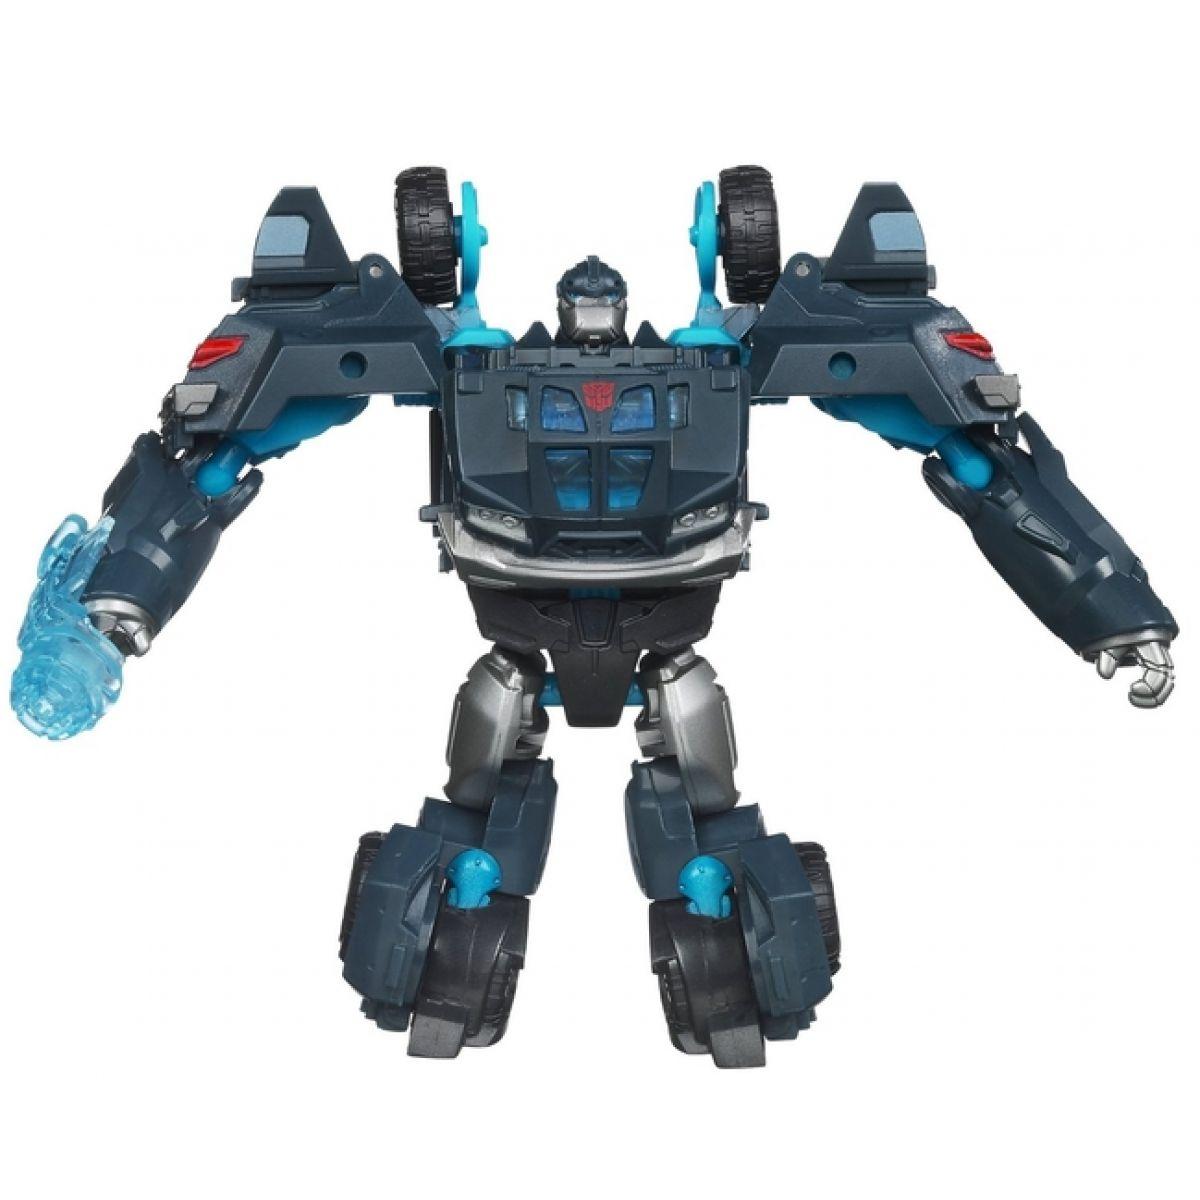 Transformers Cyberverse Commander Hasbro - Battle Tactics Bulkhead